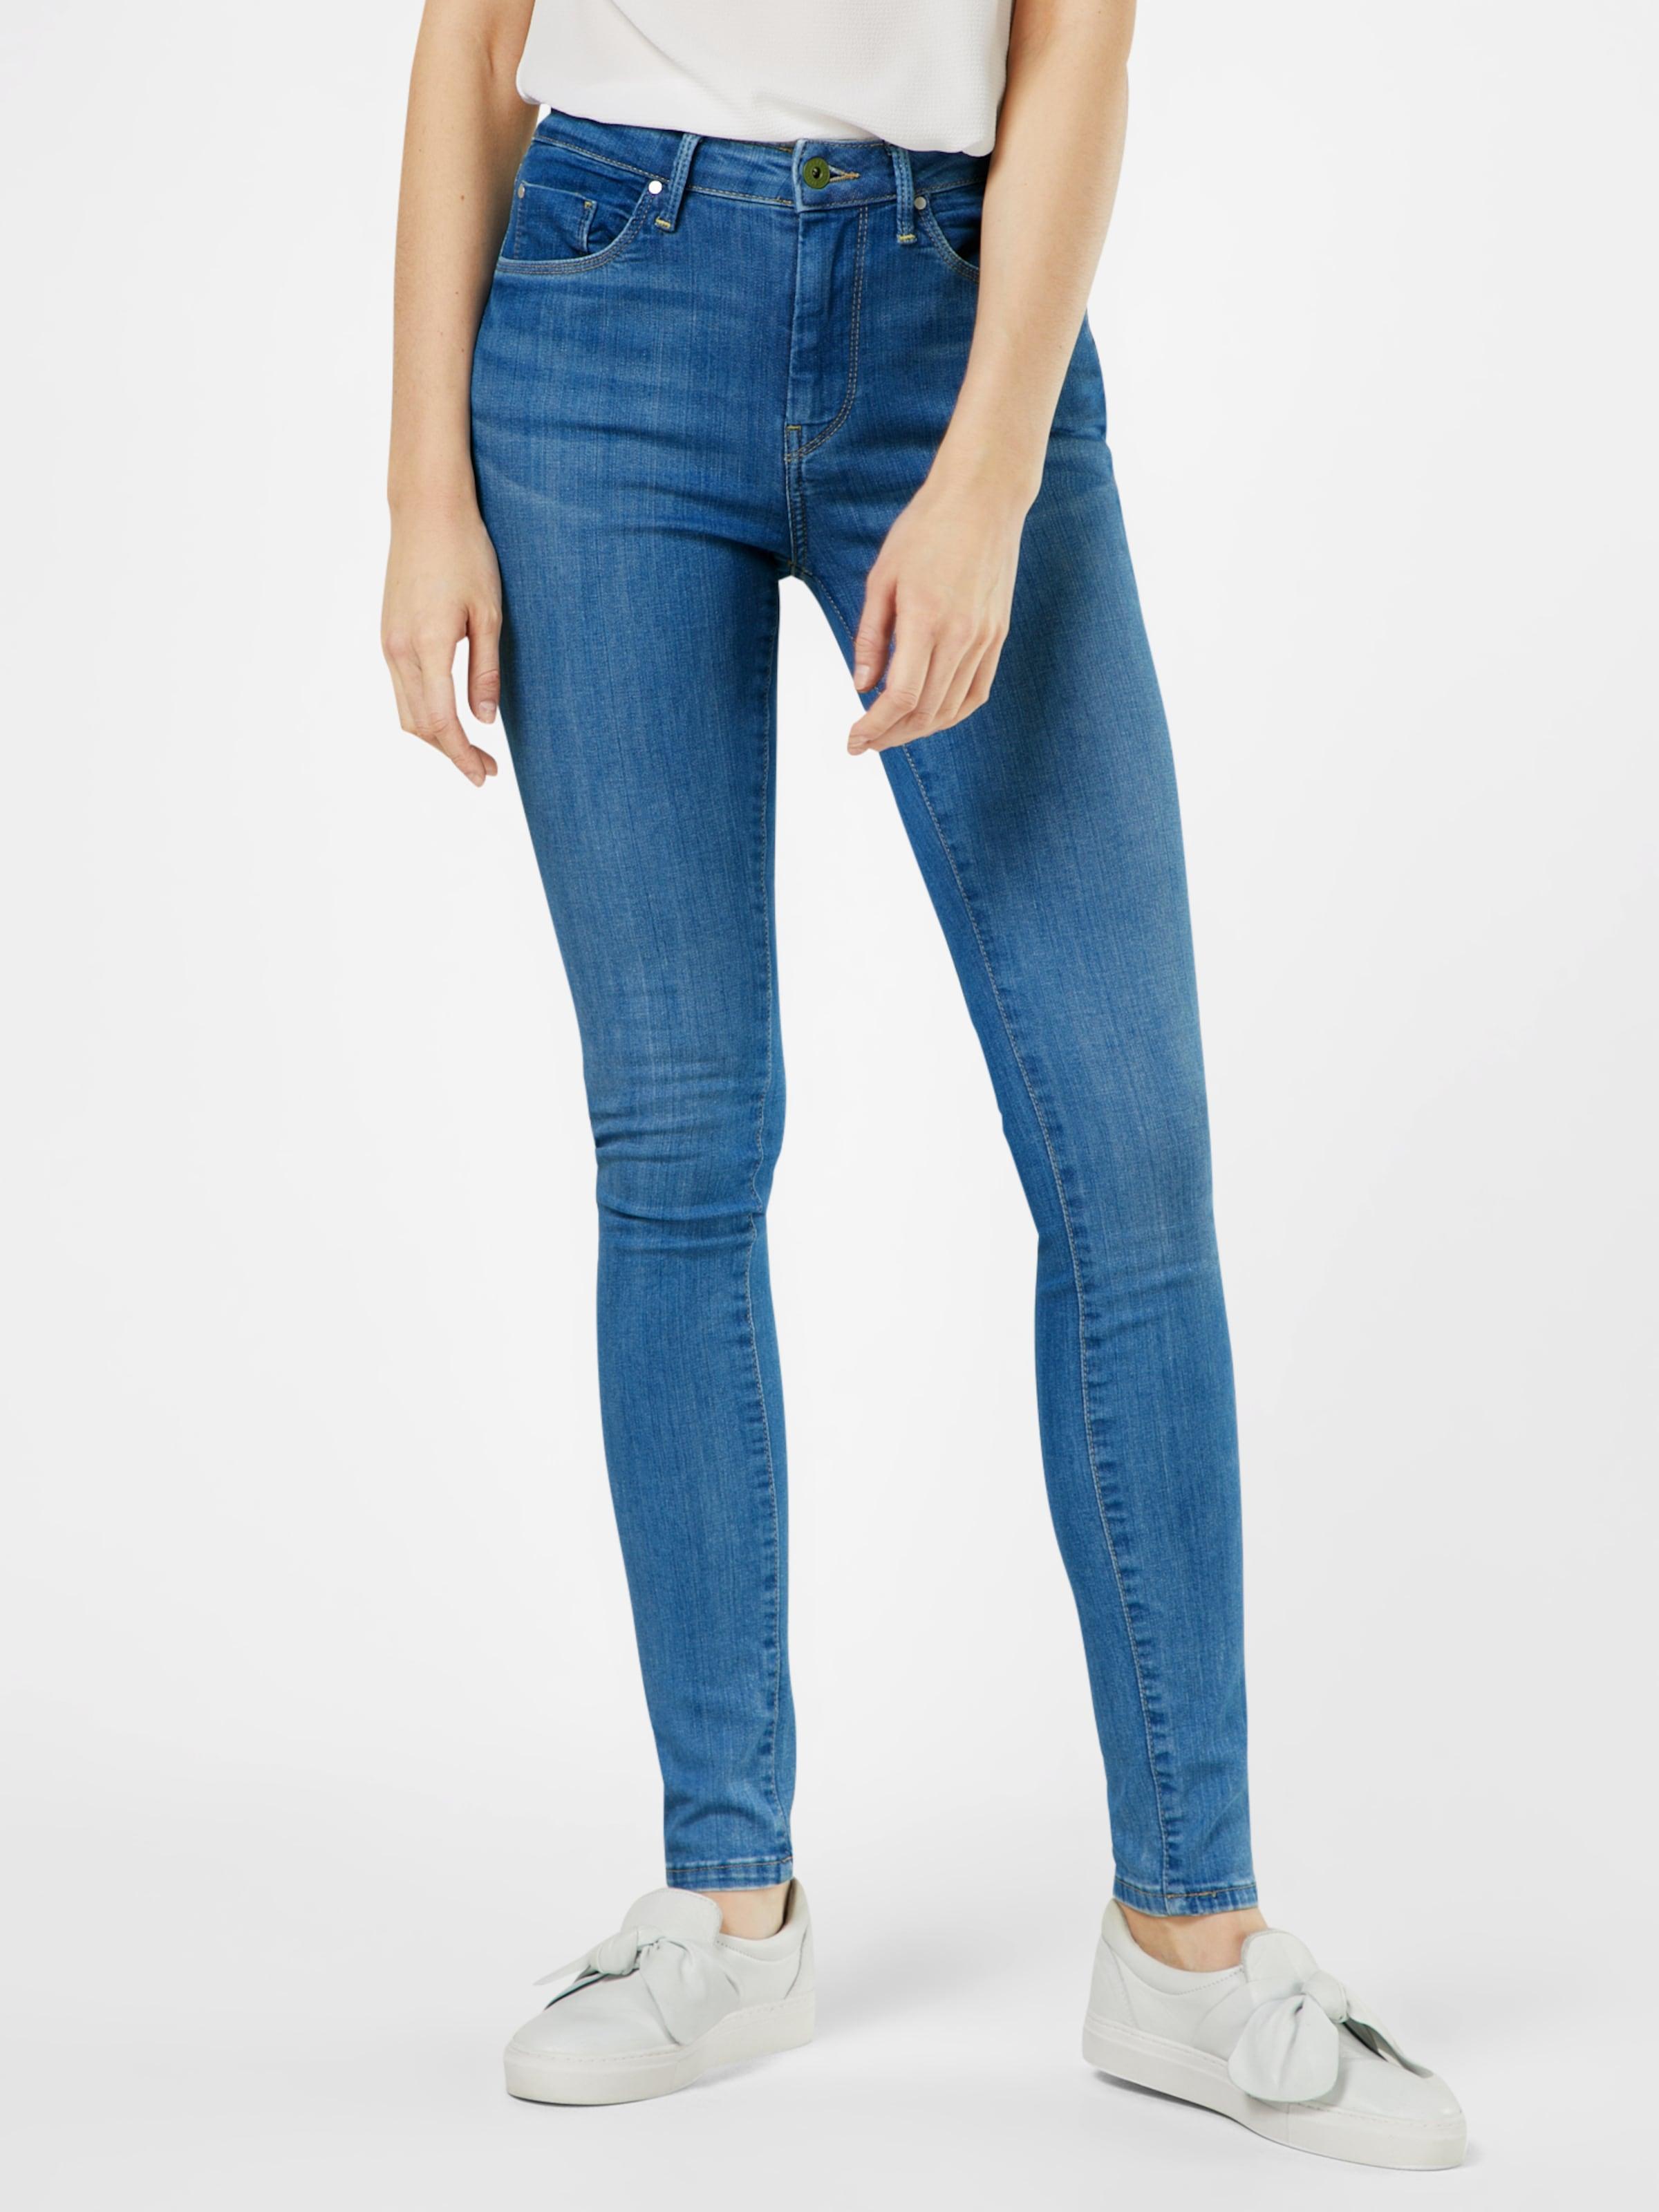 Pepe Jeans Jeans 'REGENT' Bester Verkauf Günstig Online Genießen HYJNAS